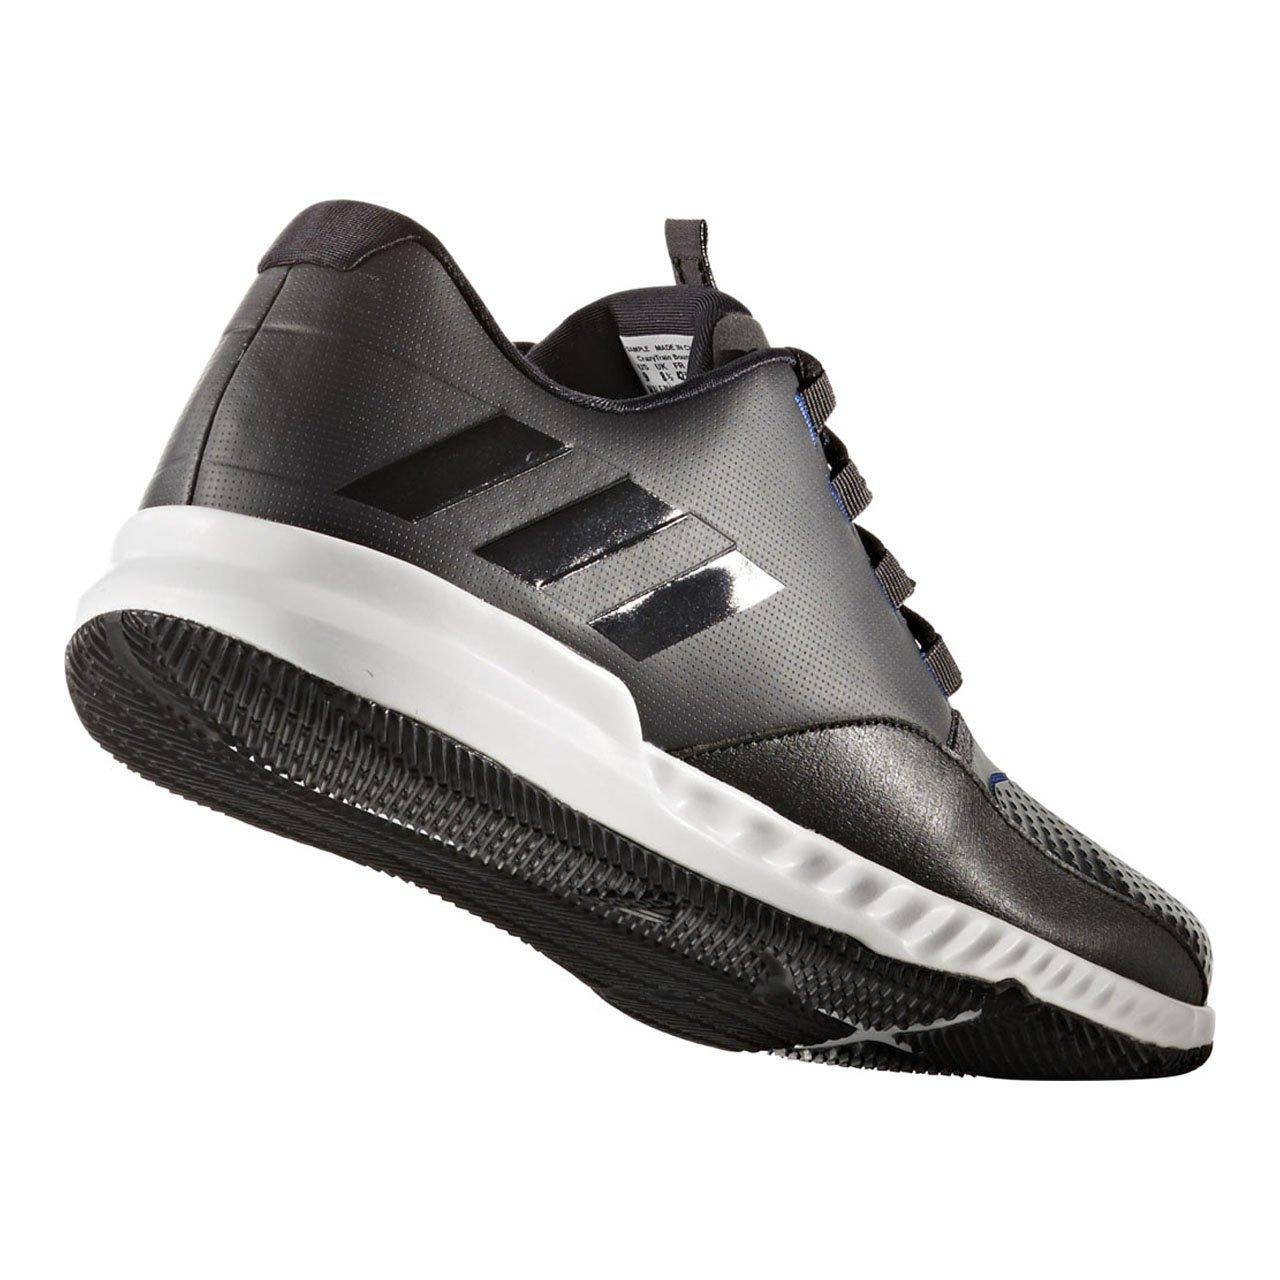 new product 693fb 1e2c7 ... Adidas Menn Springblade Pro Syntetiske Joggesko 9VHp1fT ...